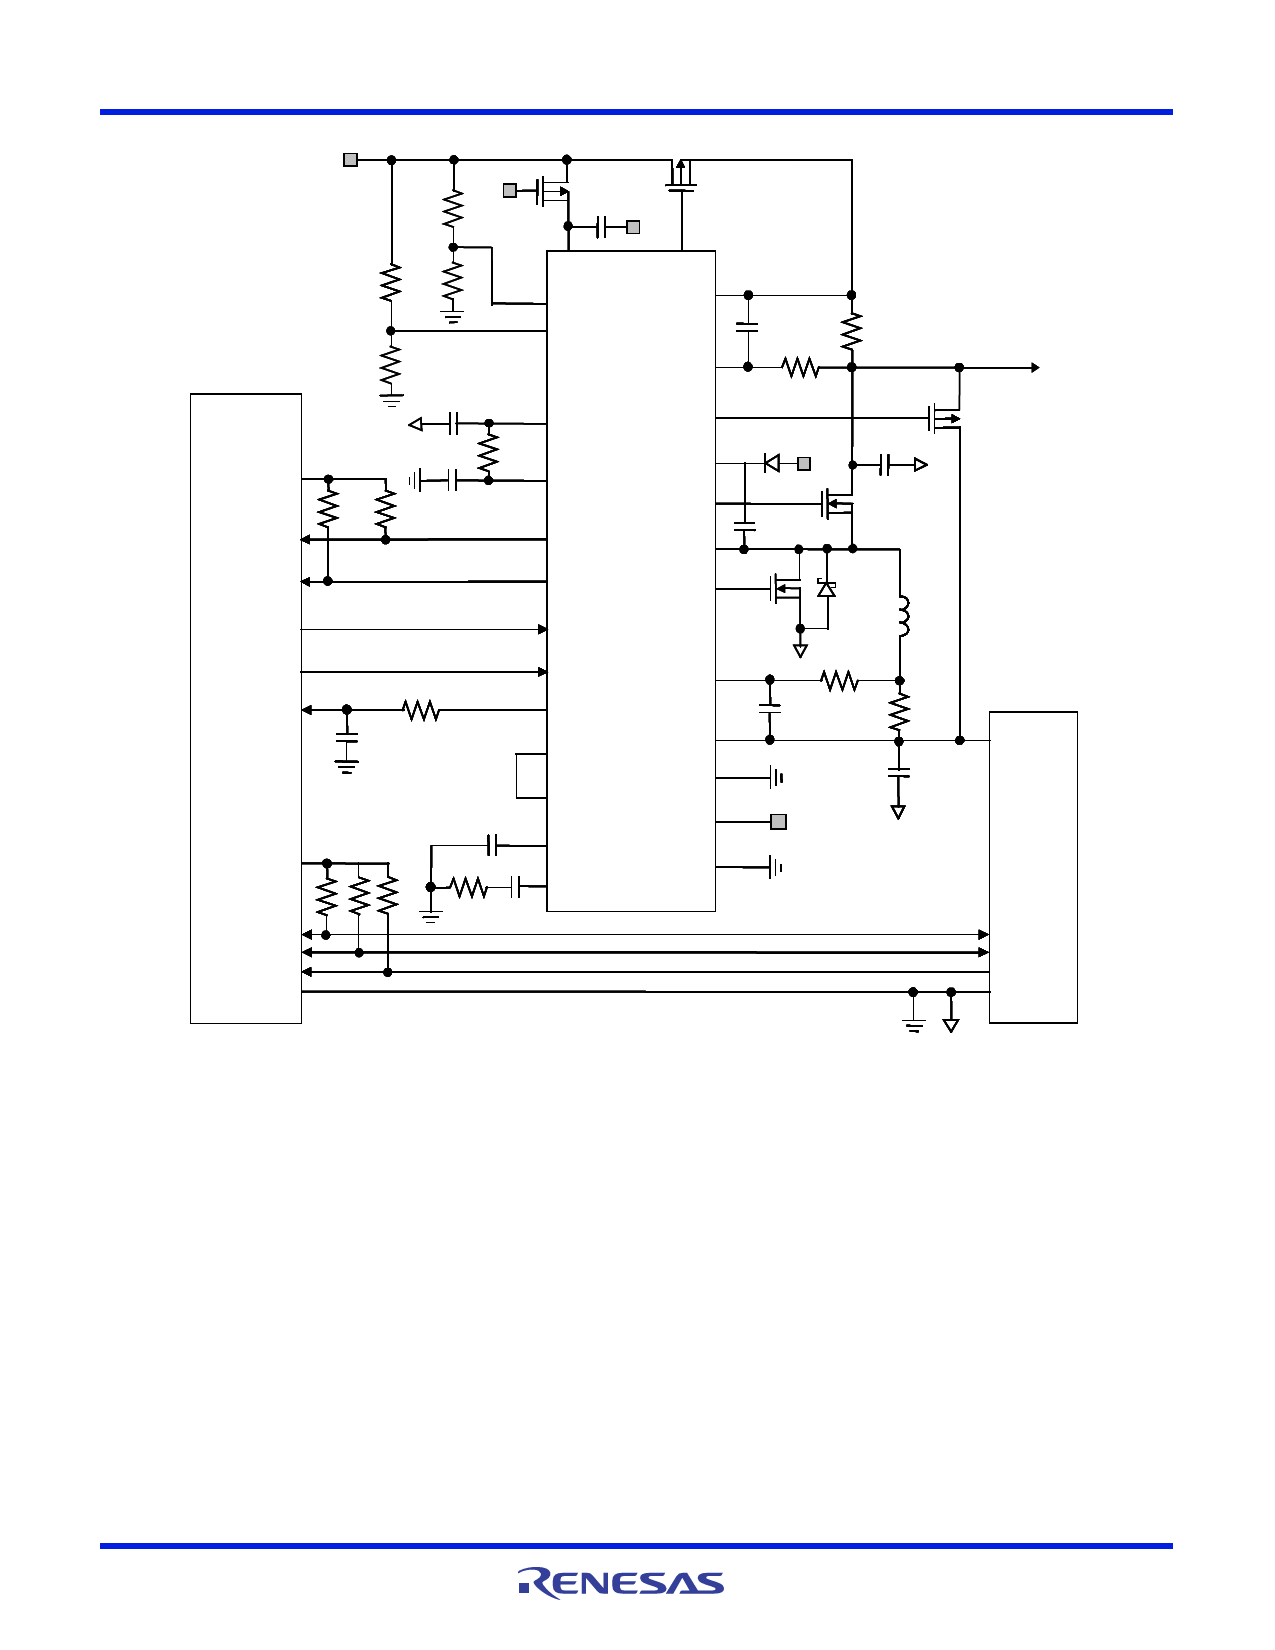 Isl6255 datasheet | renesas datasheetspdf. Com.